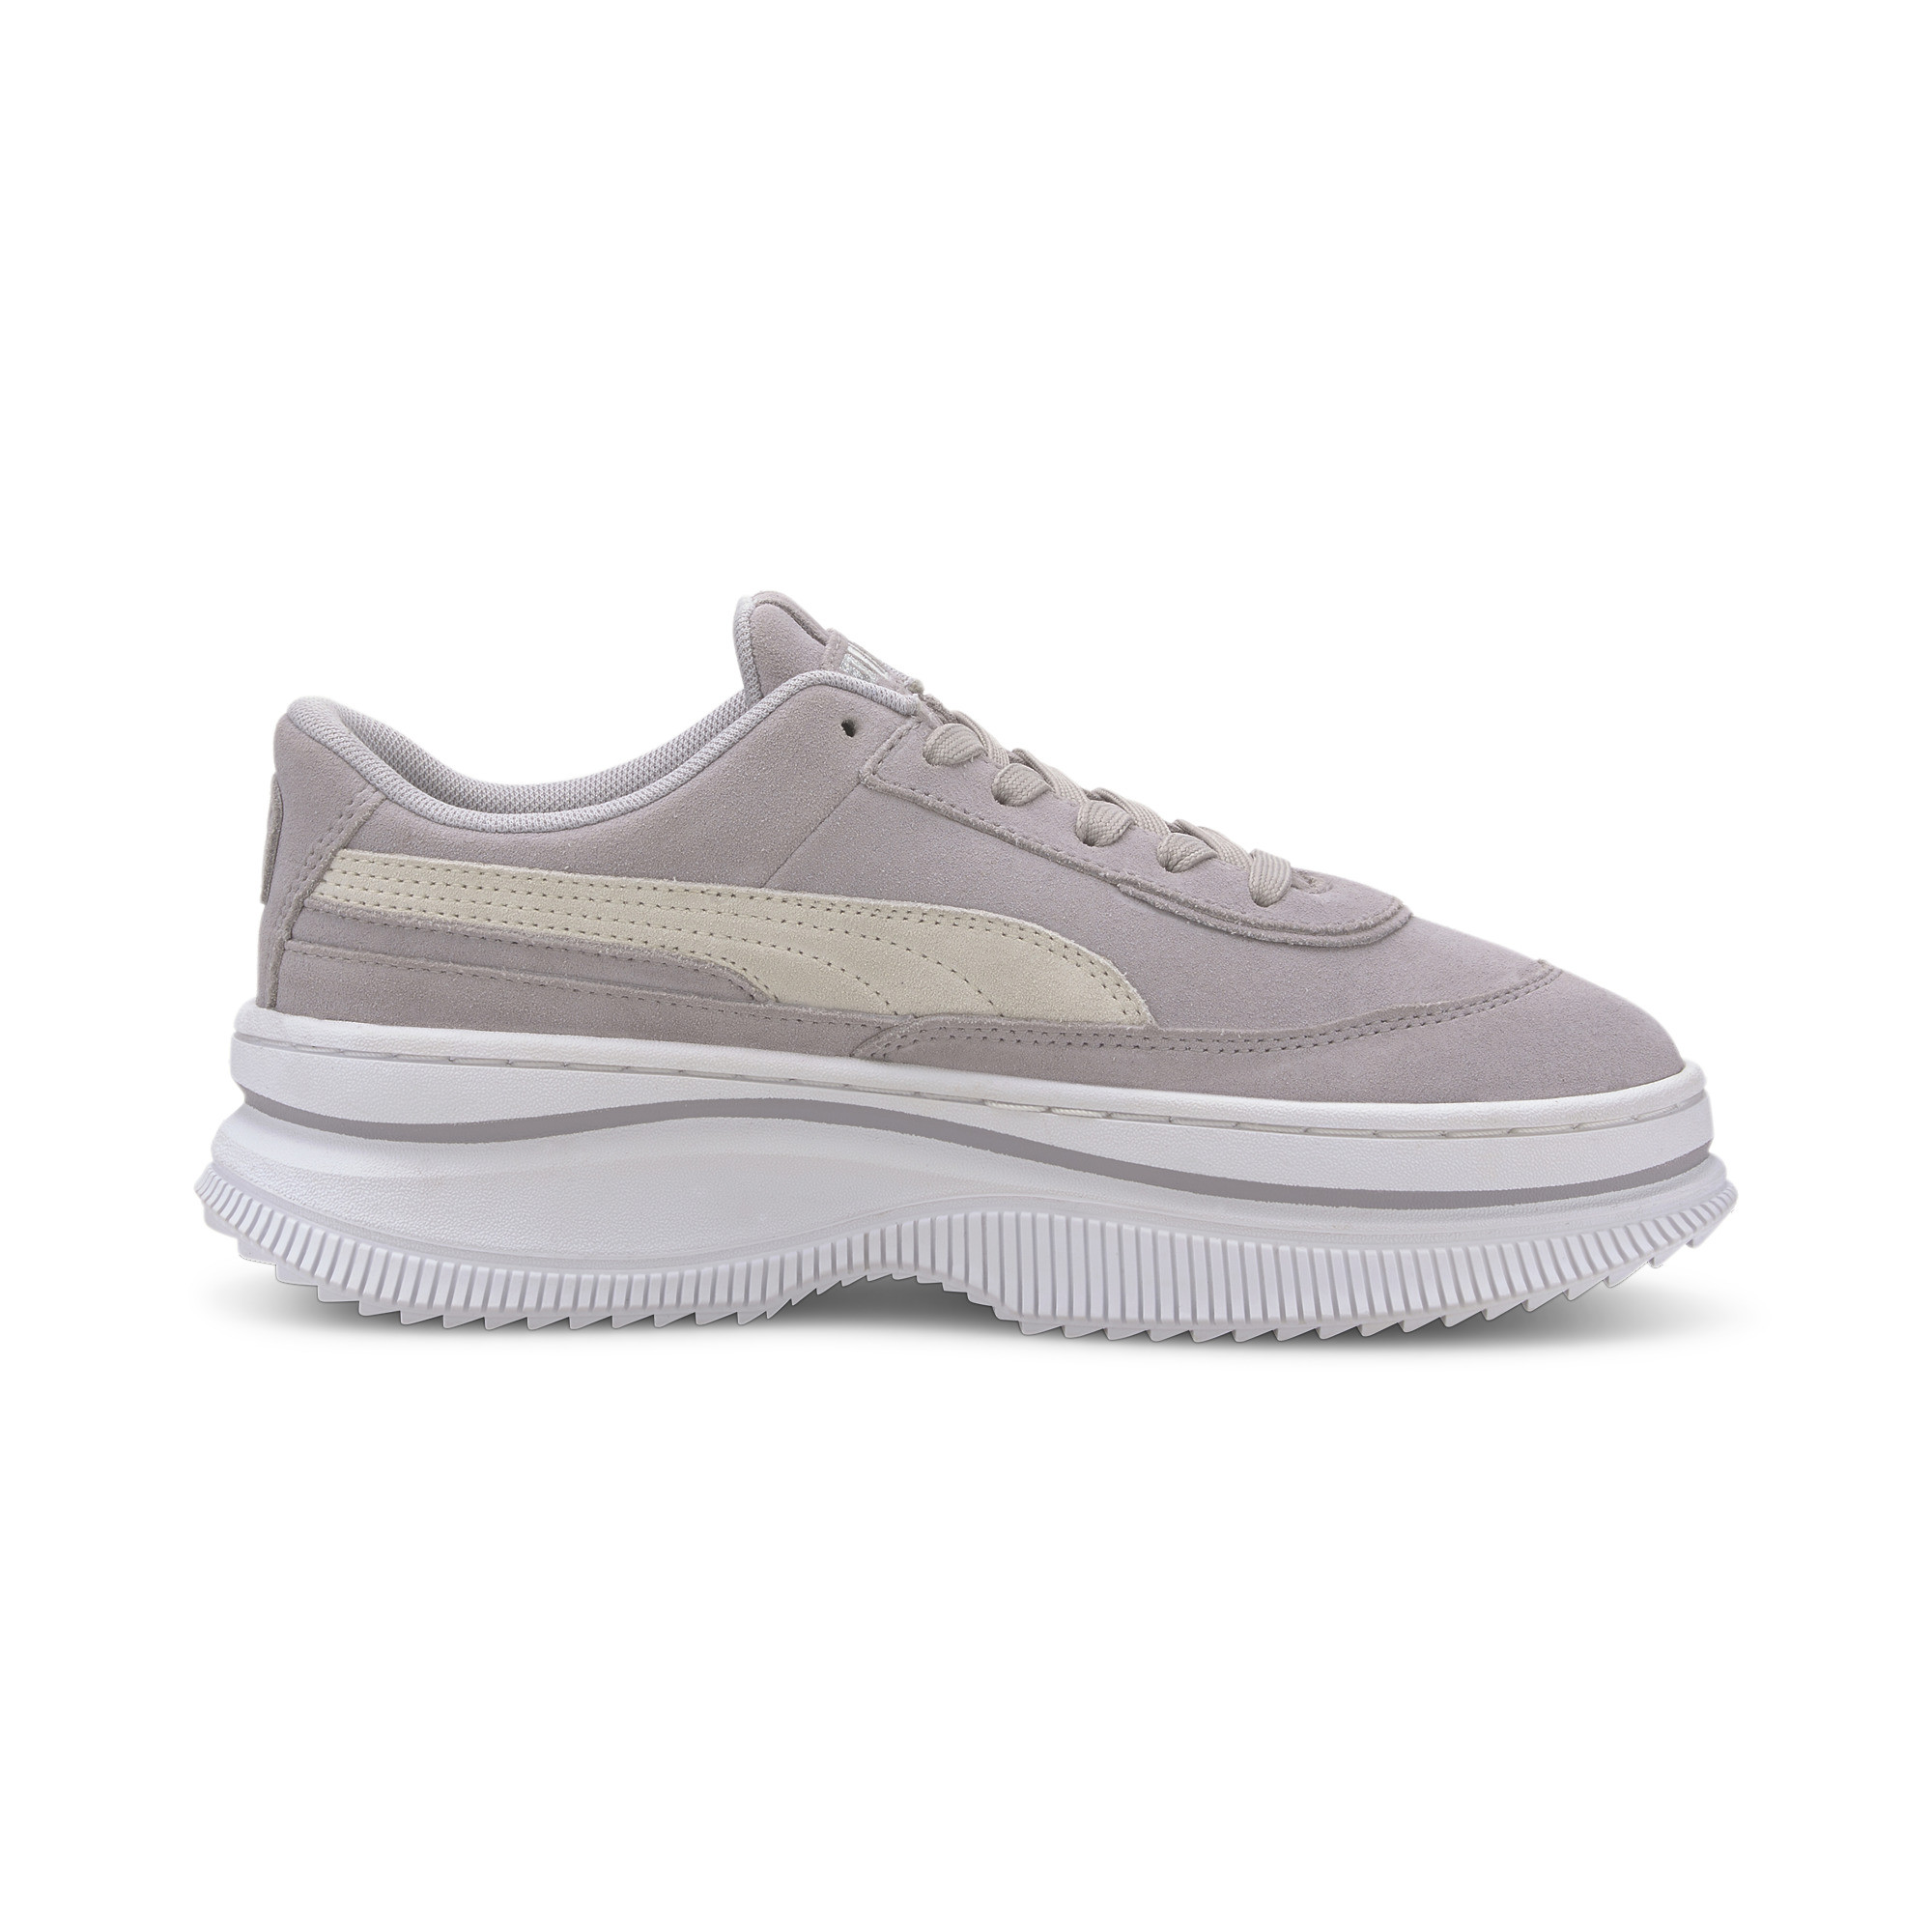 PUMA-Women-039-s-DEVA-Suede-Sneakers thumbnail 21